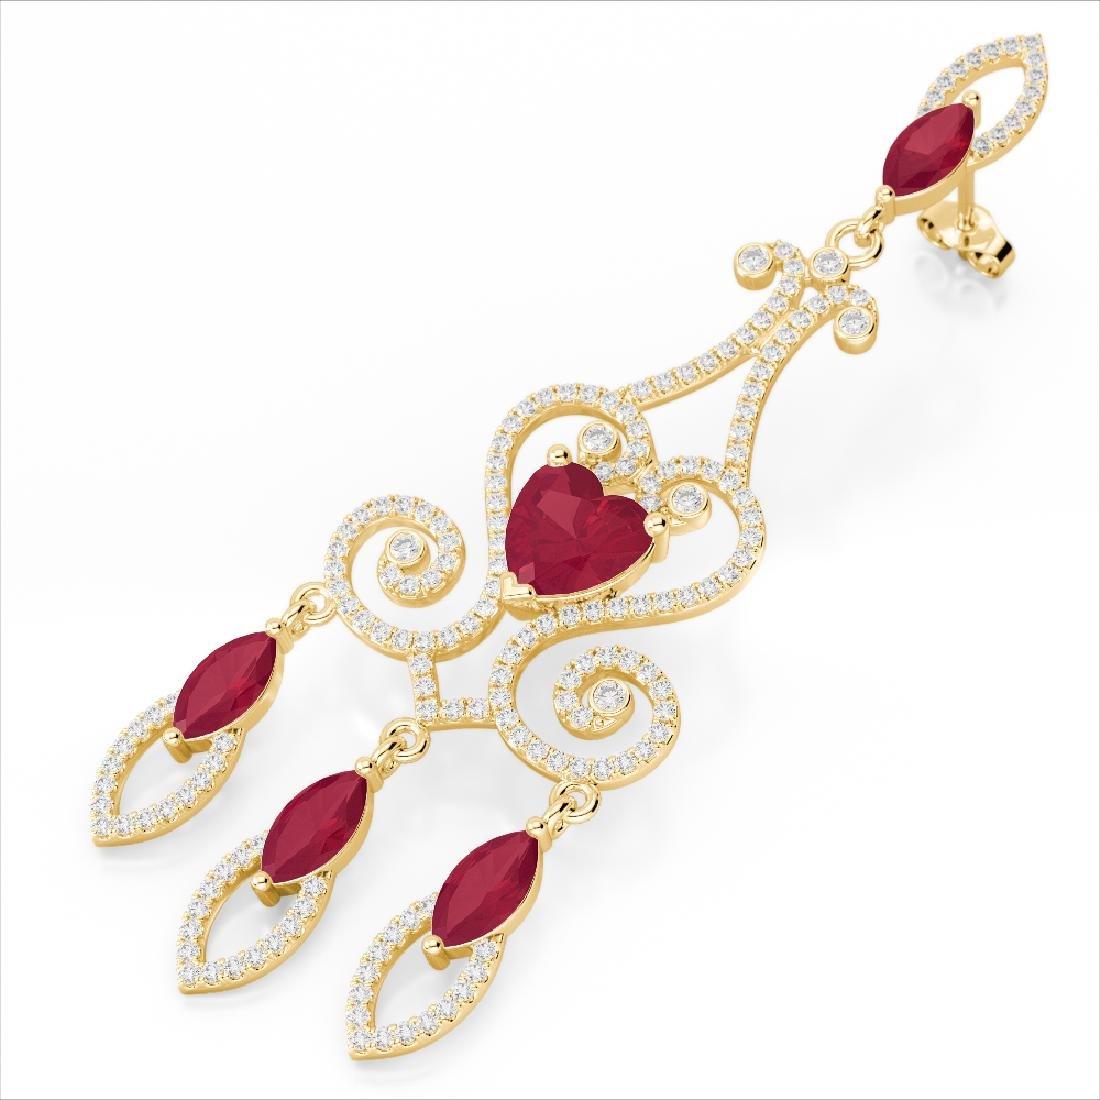 11 CTW Ruby & Micro Pave VS/SI Diamond Earrings 14K